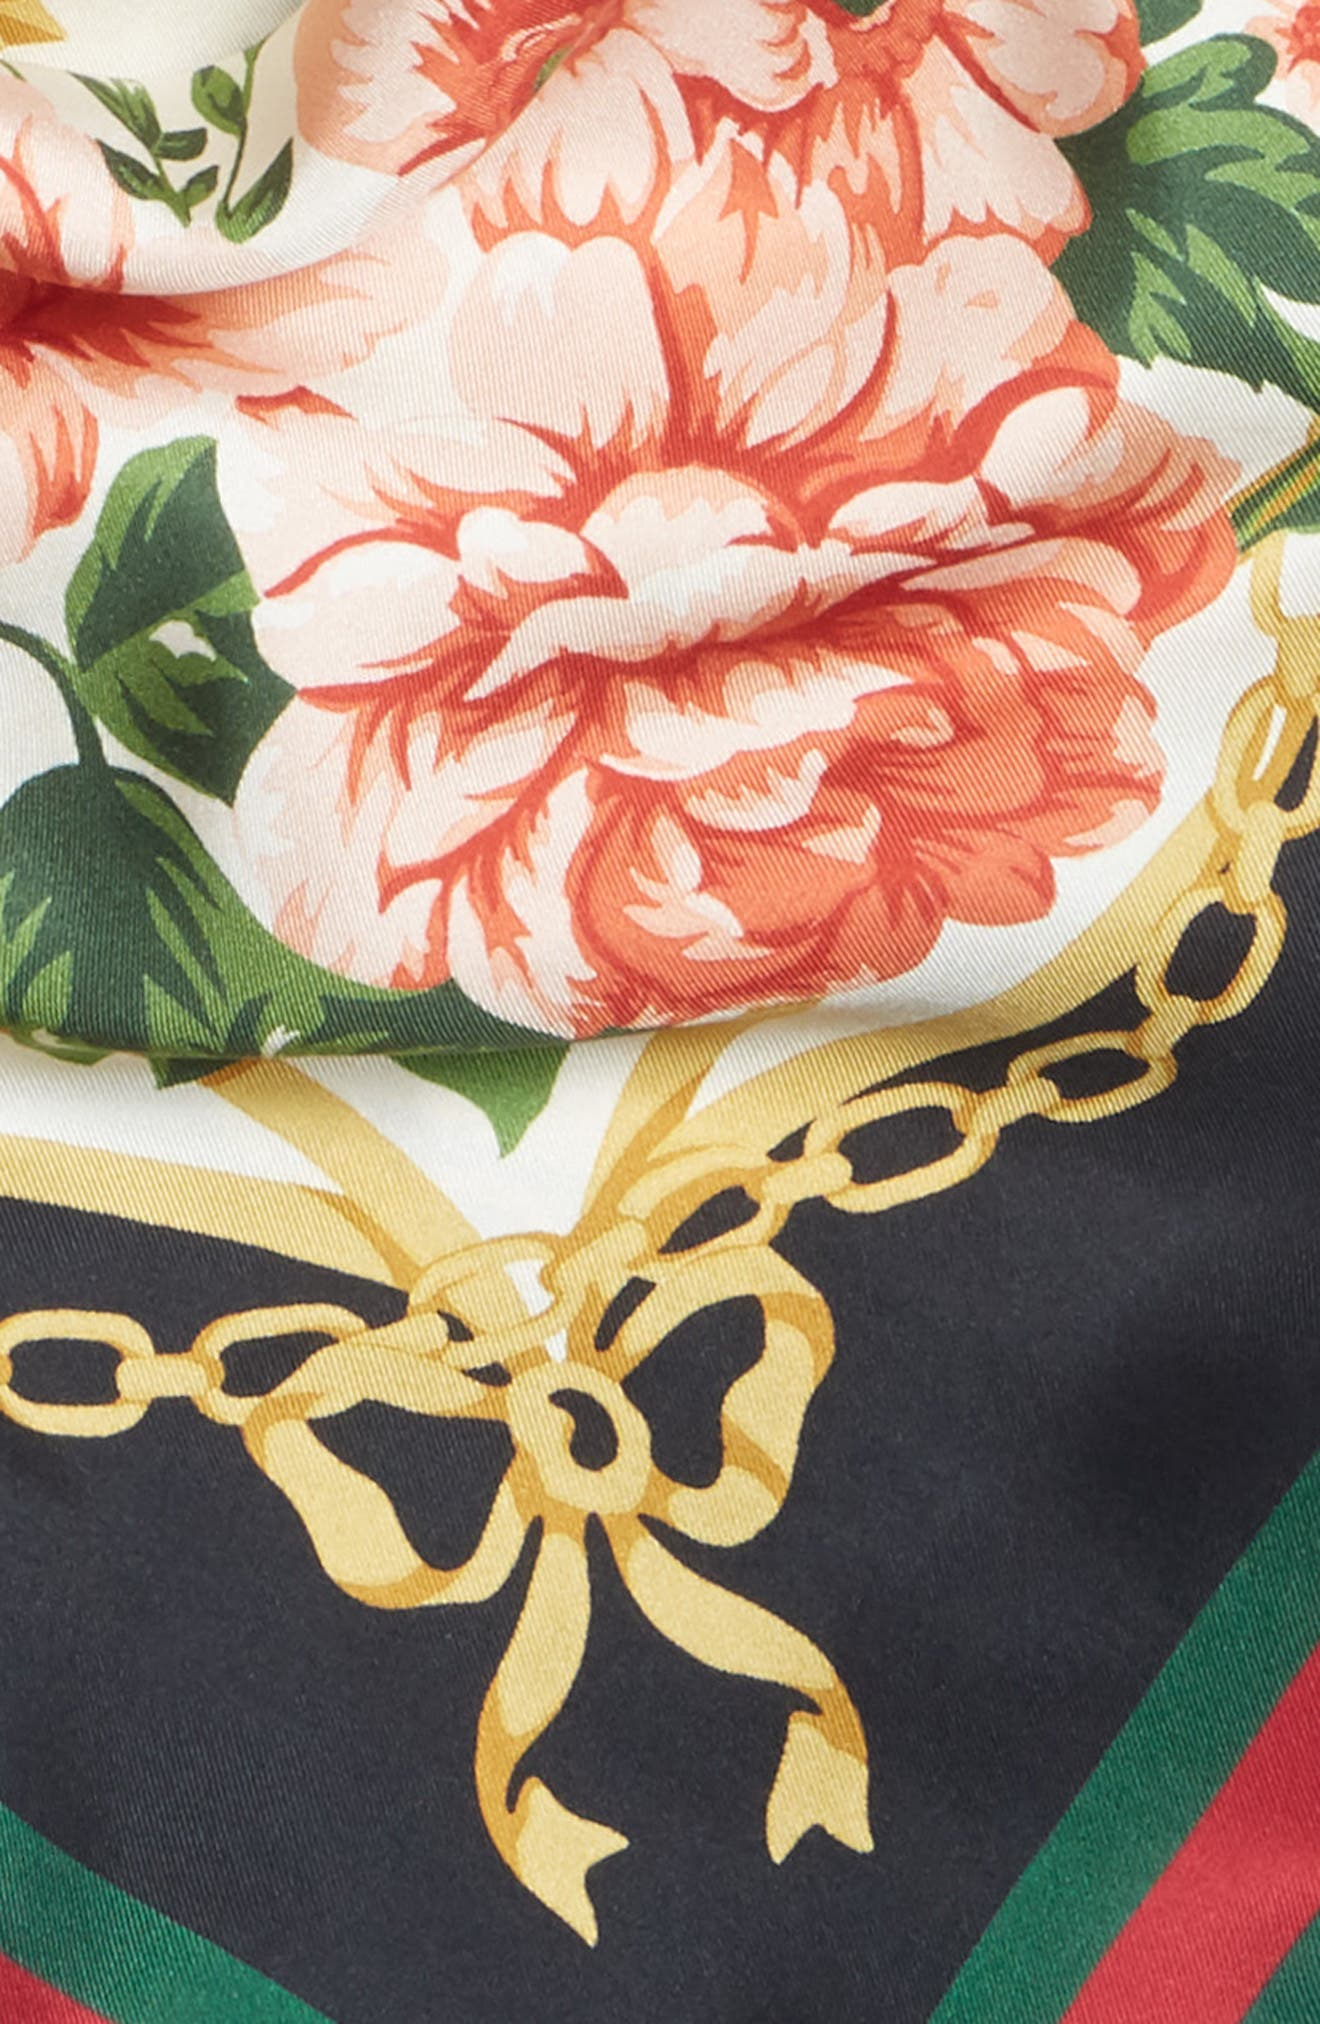 Rose Chain Foulard Silk Twill Scarf,                             Alternate thumbnail 4, color,                             Cream/ Blk